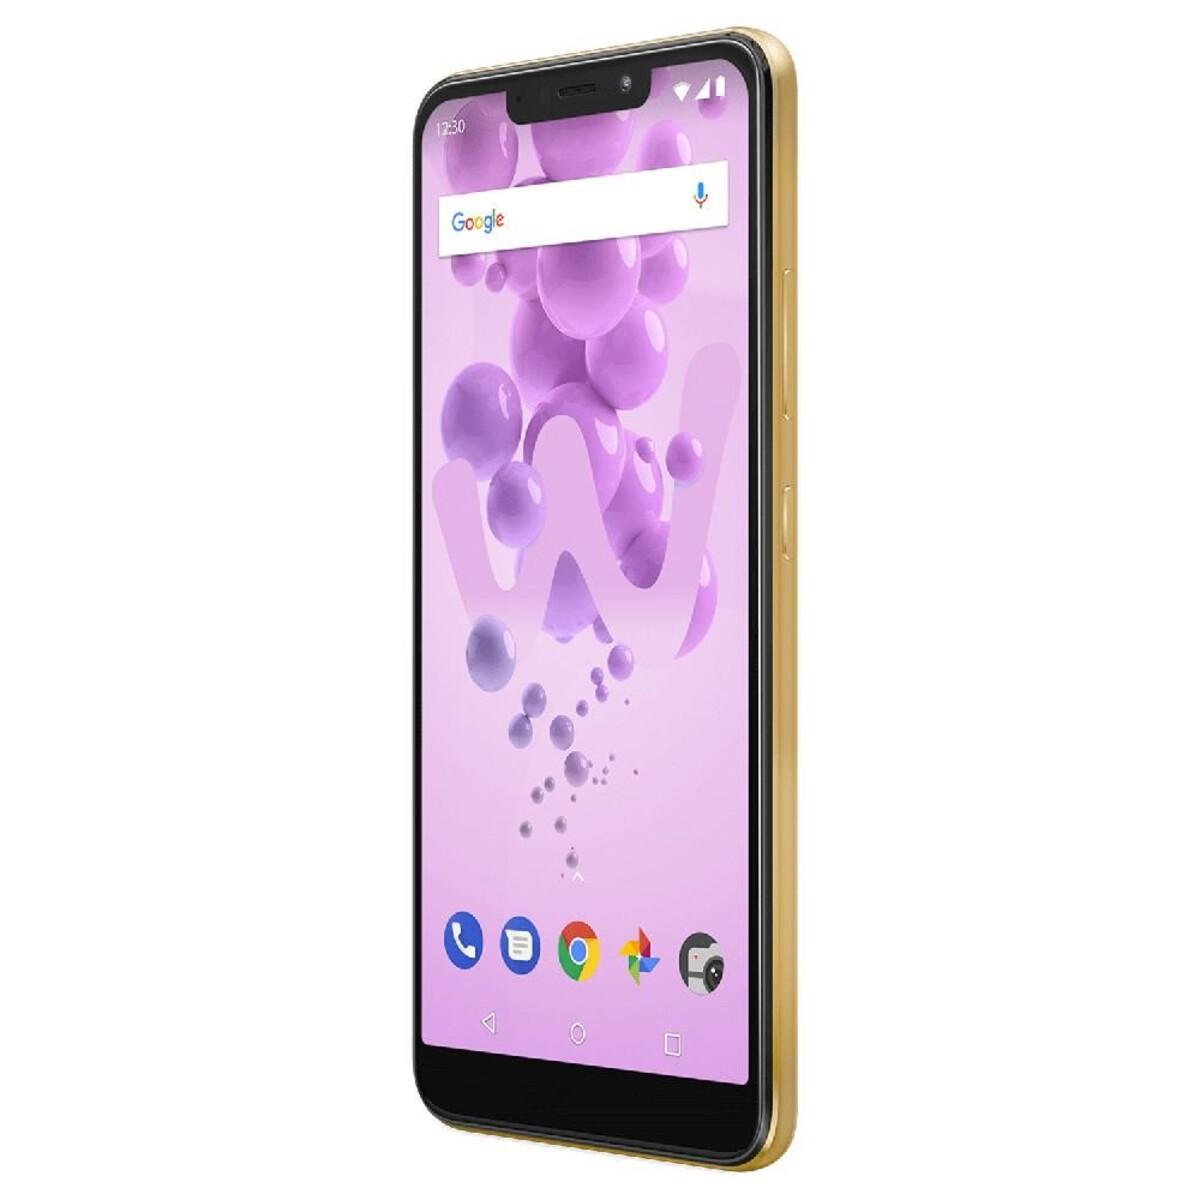 Bild 4 von Wiko View 2 Go Dual-SIM gold Smartphone (5,93 Zoll, 32 GB, 4.000-mAh, Octa-Core, Fingerabdrucksensor)